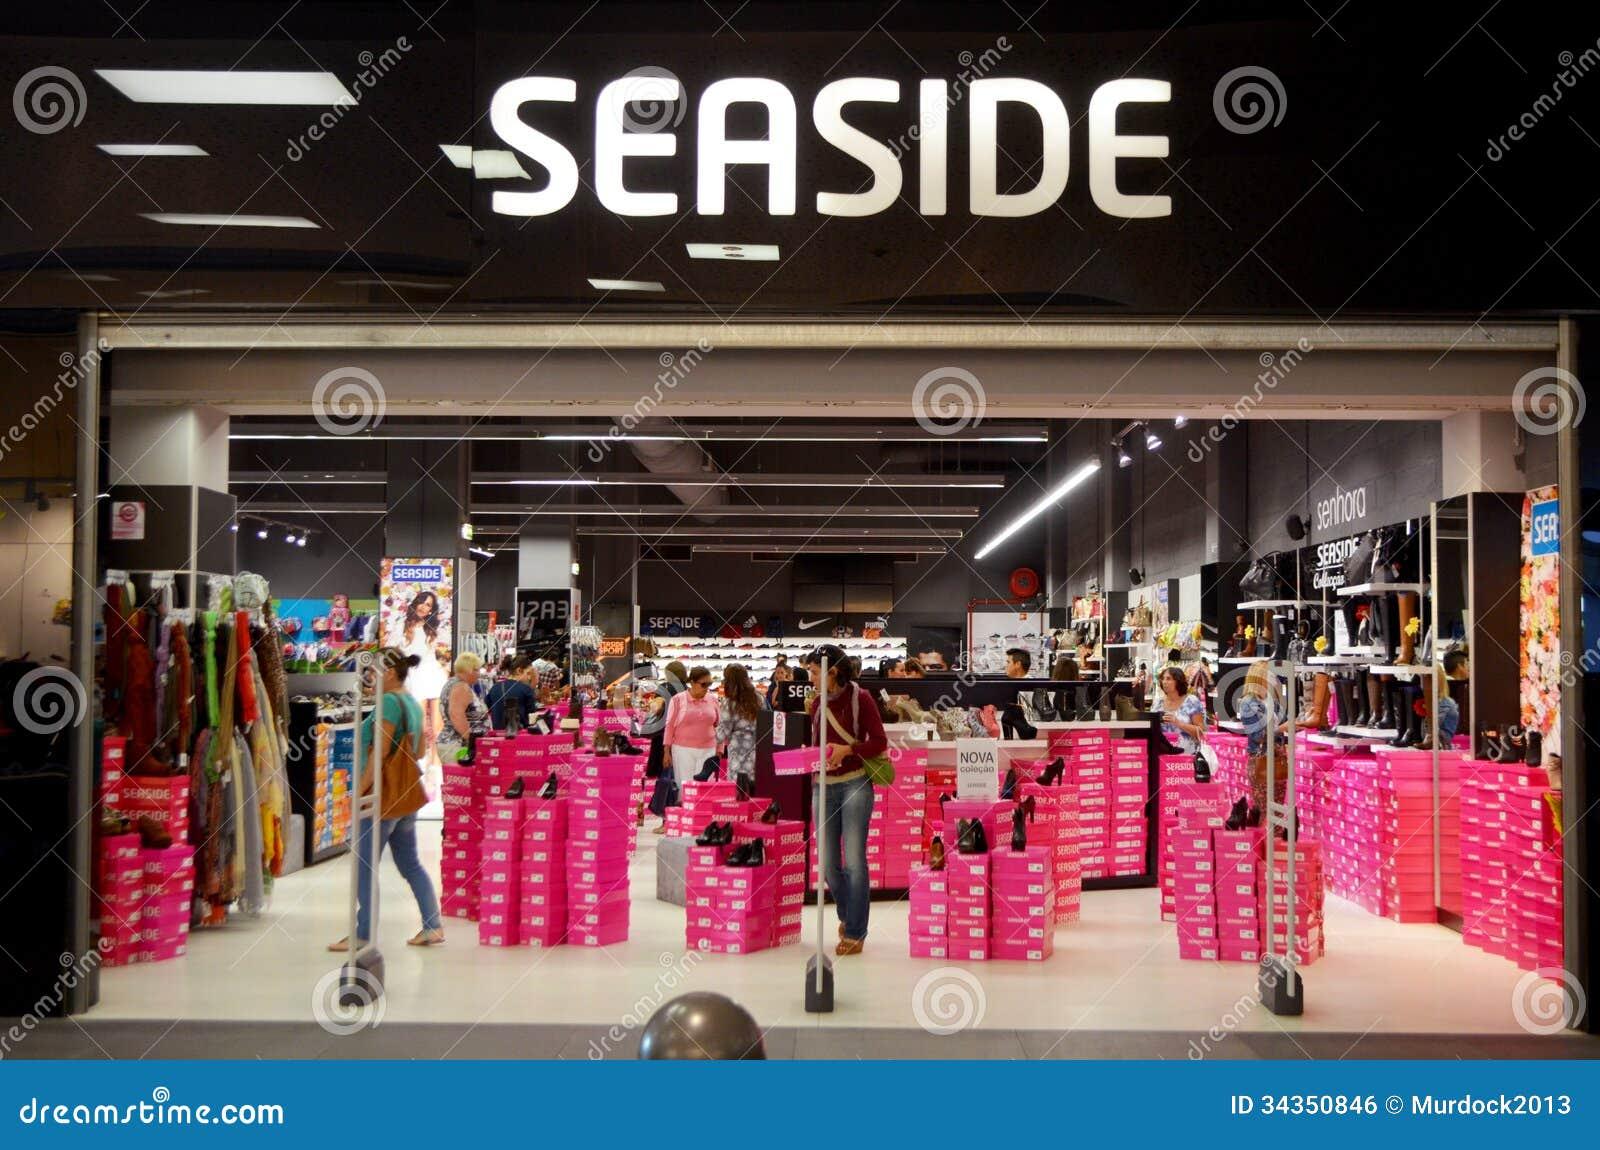 business plan magasin de chaussures seaside